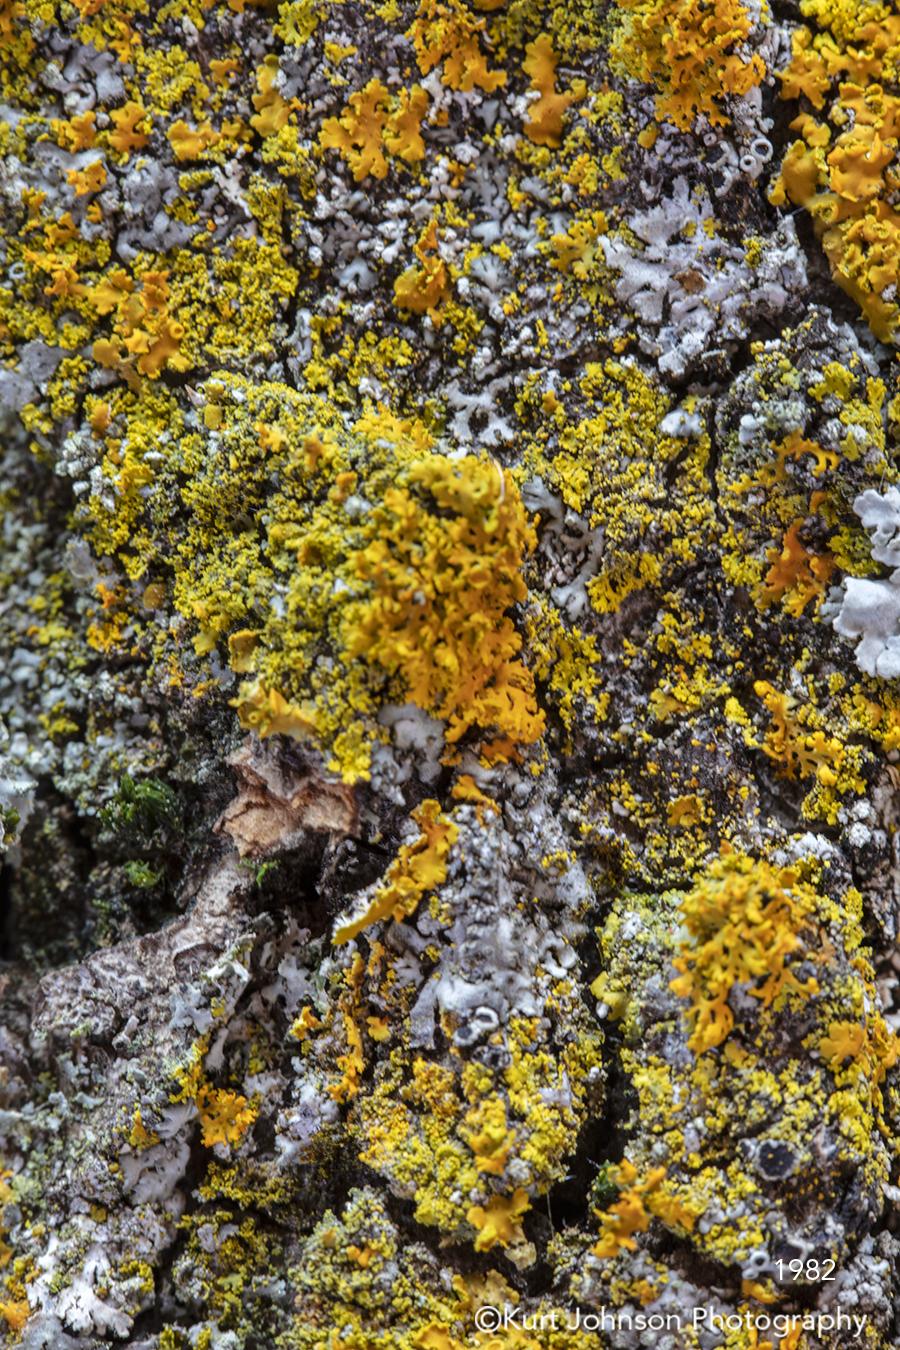 yellow gray green tree bark moss close up pattern texture detail close up